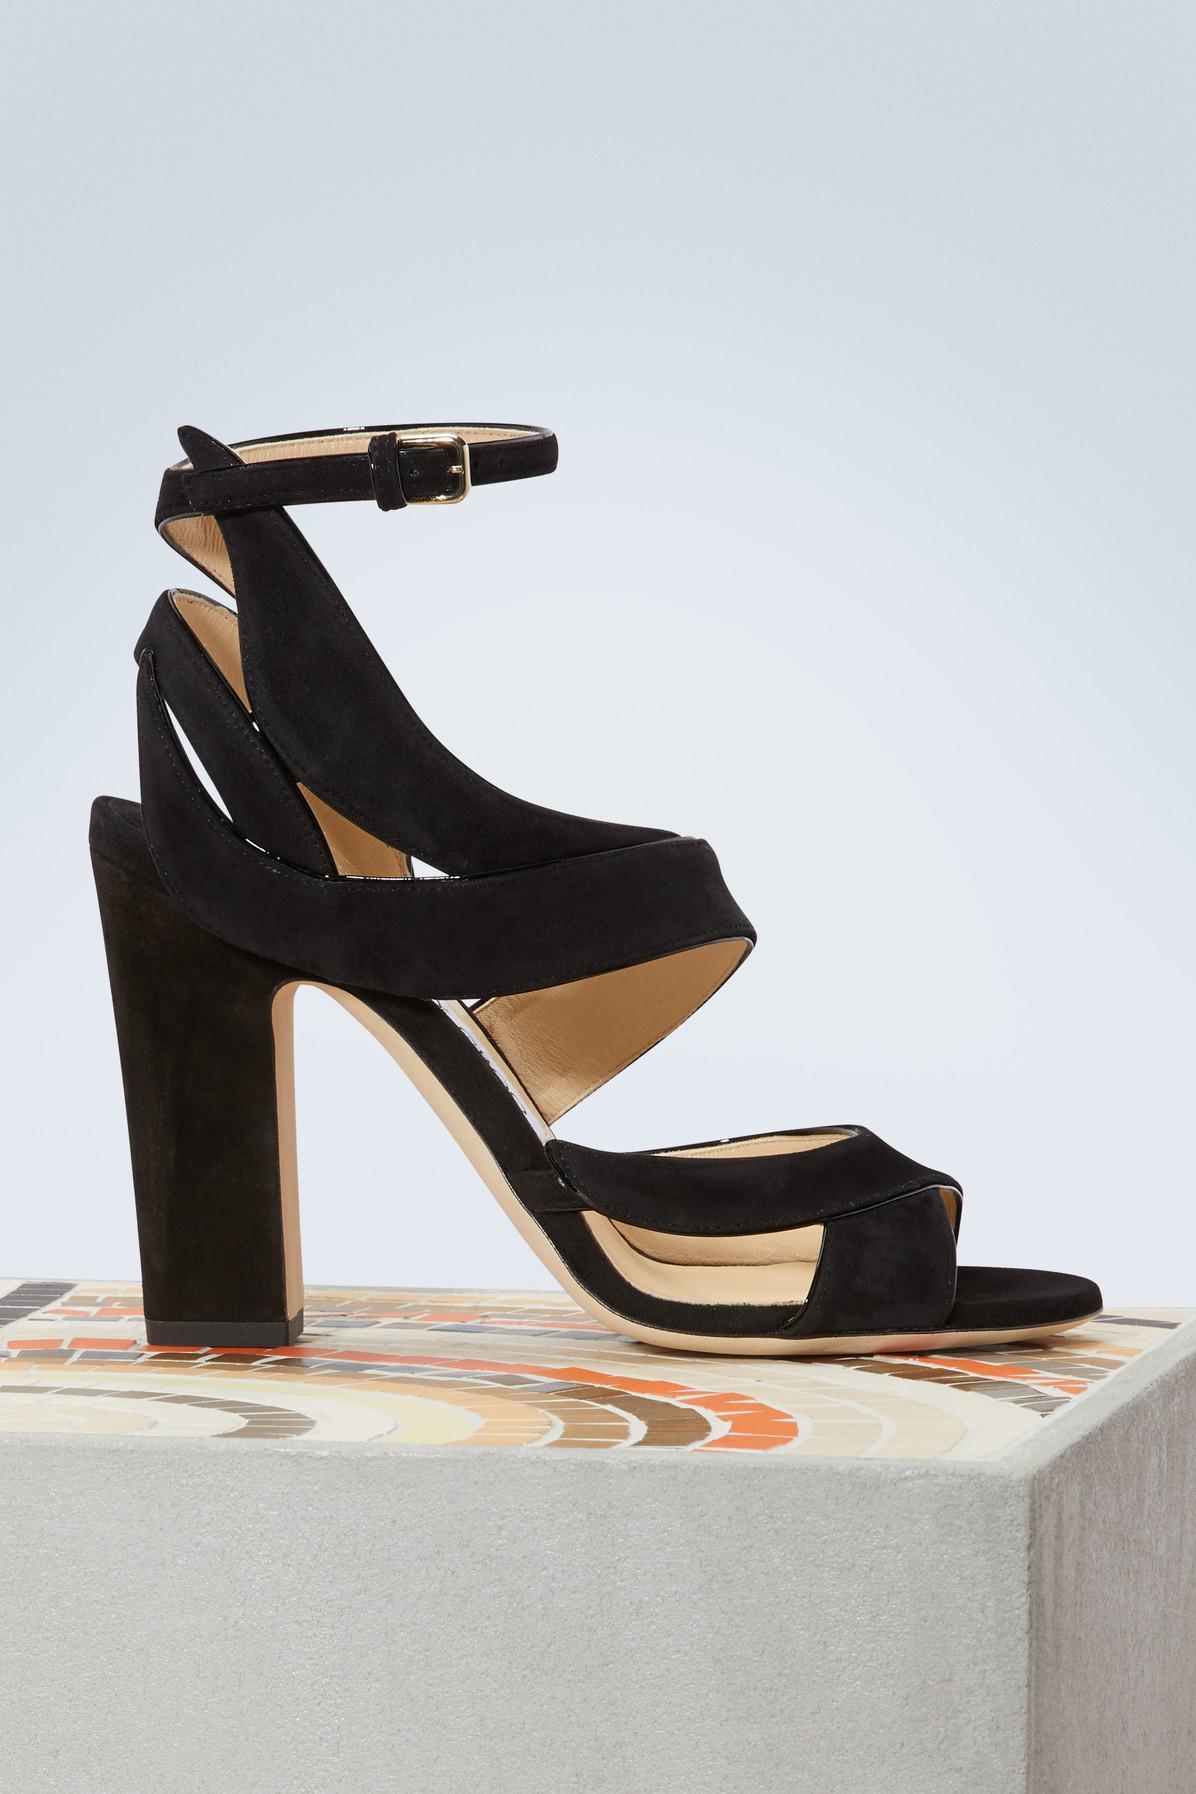 4b8ede0651756a Jimmy Choo Falcon 100 Sandals in Black - Lyst